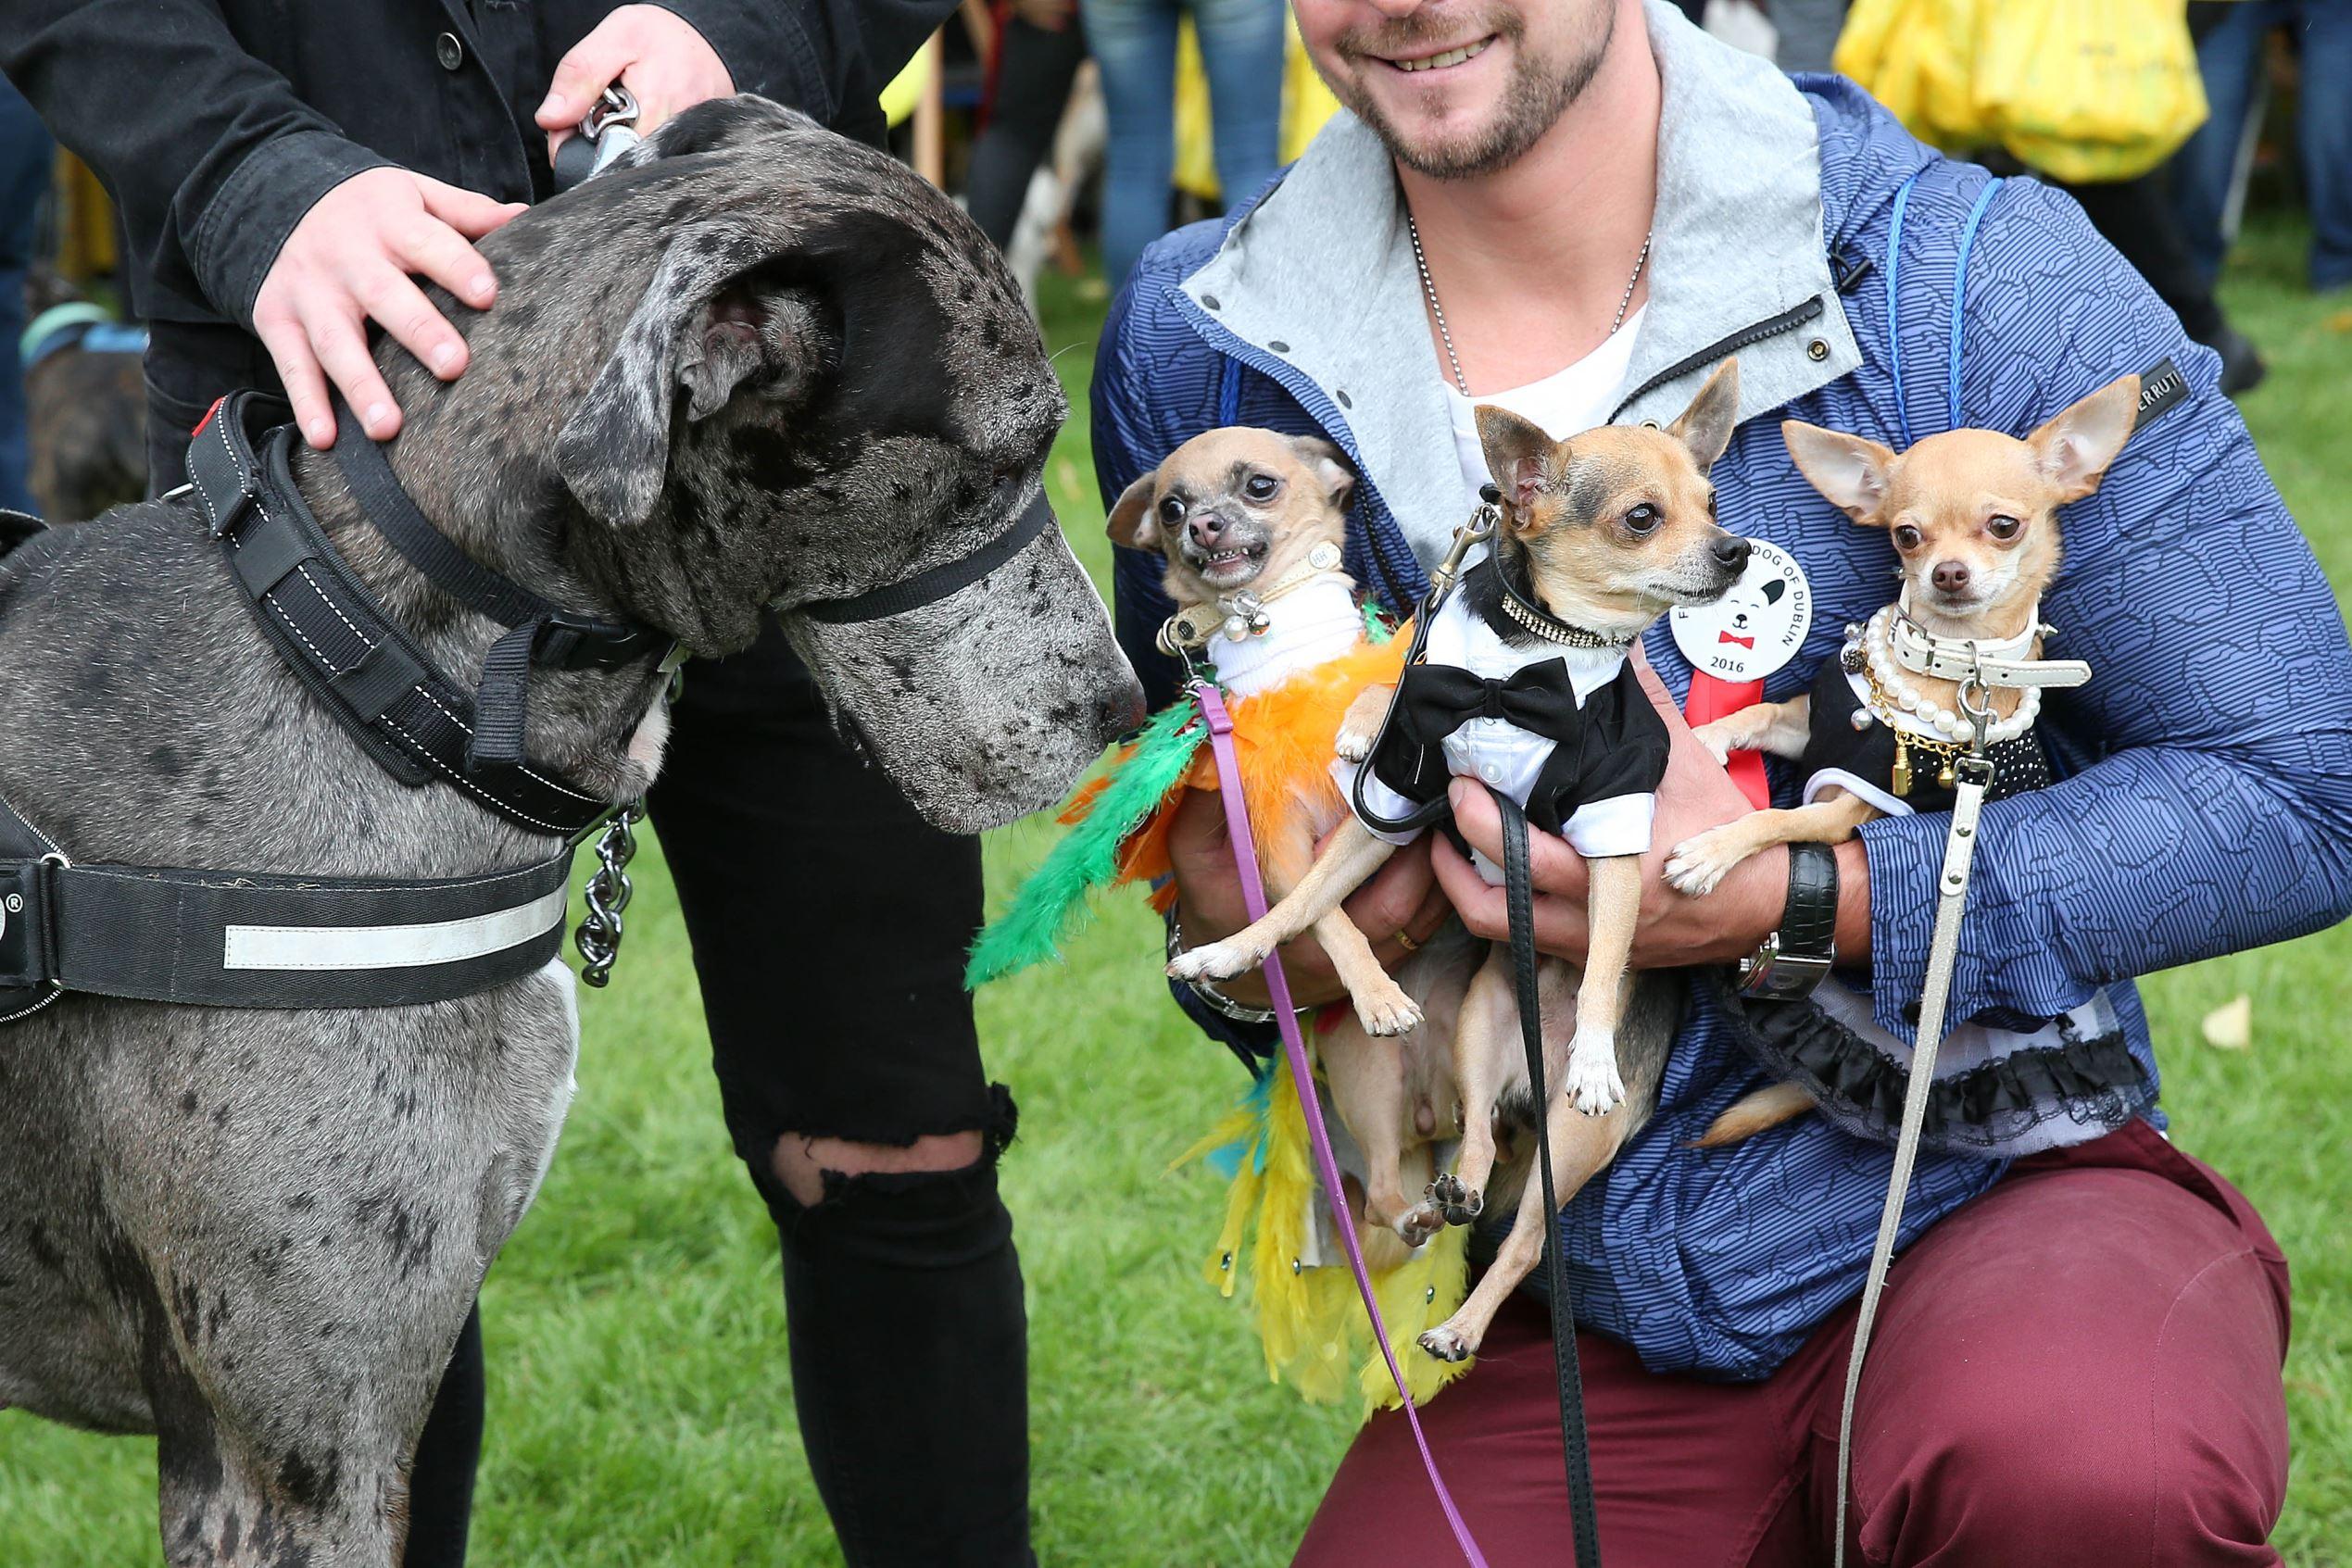 Слайд 9 из 67: The Doggie Do canine festival, Dublin, Eire - 11 Sep 2016 Tomas Liudvinavicius' Chihuahuas Rambo, Daisy and Chloe meet Theo Foley's dog Django